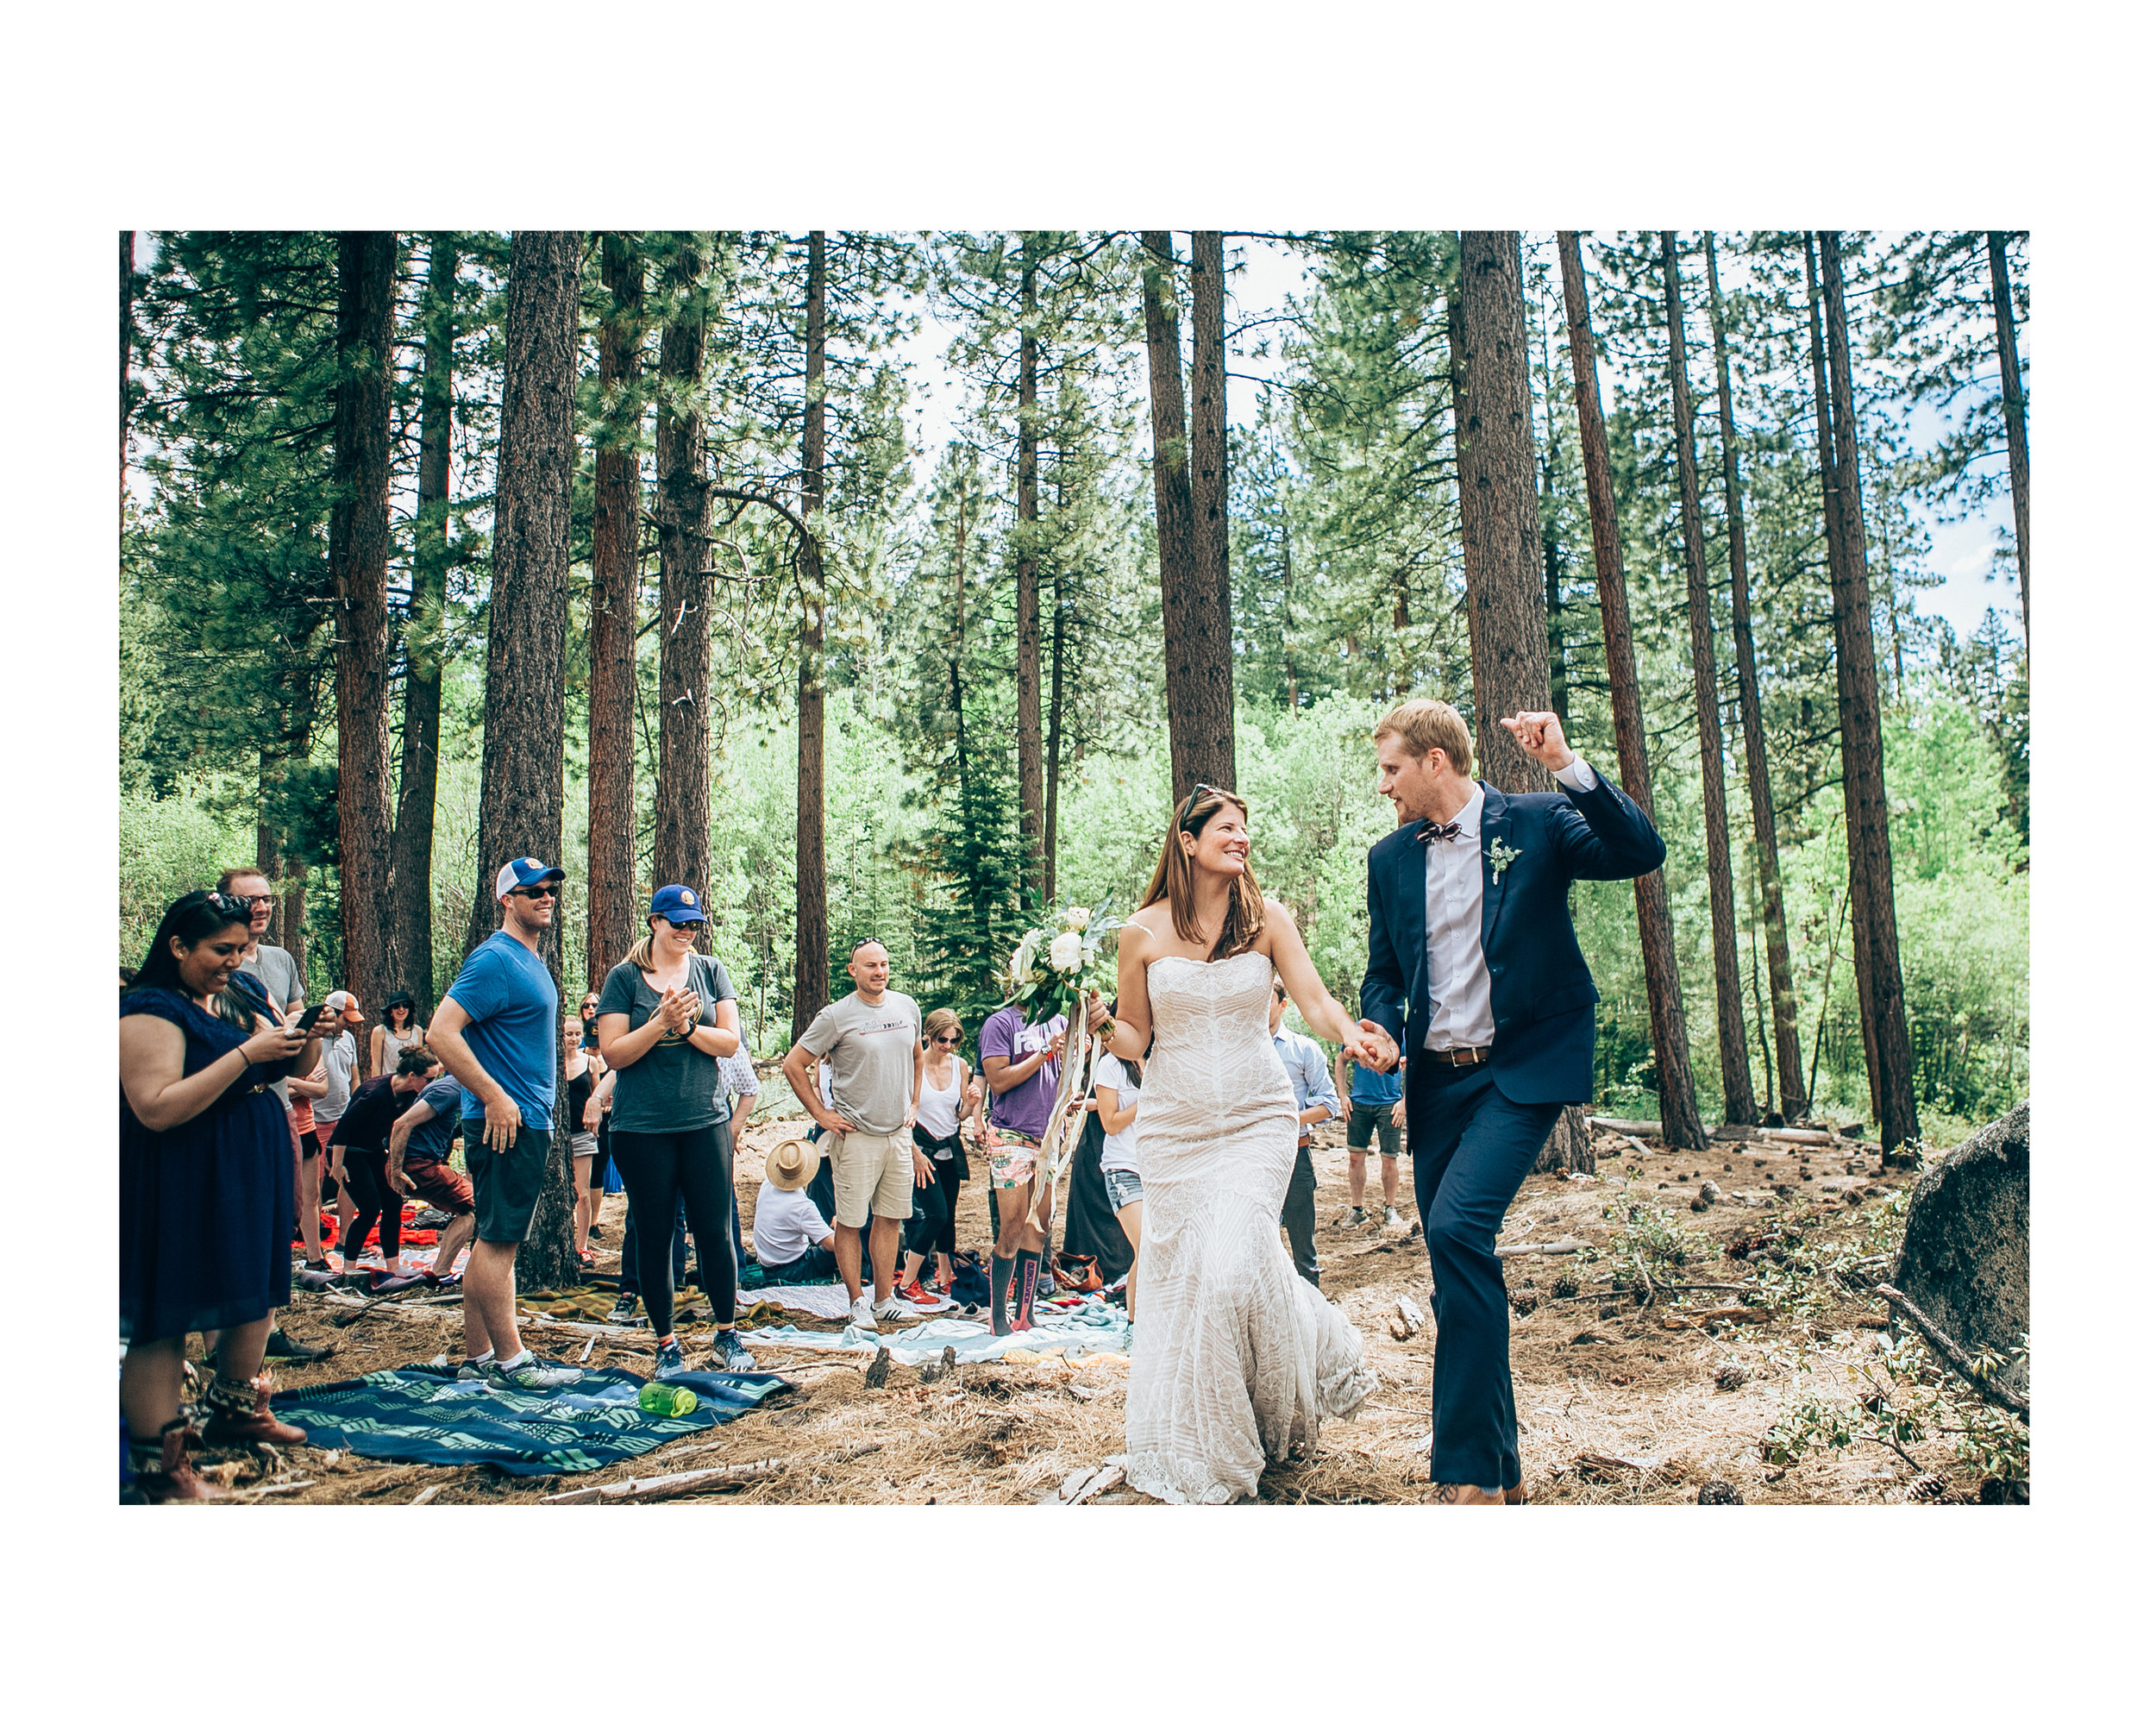 Melisa&David_Wedding_Day_019.jpg